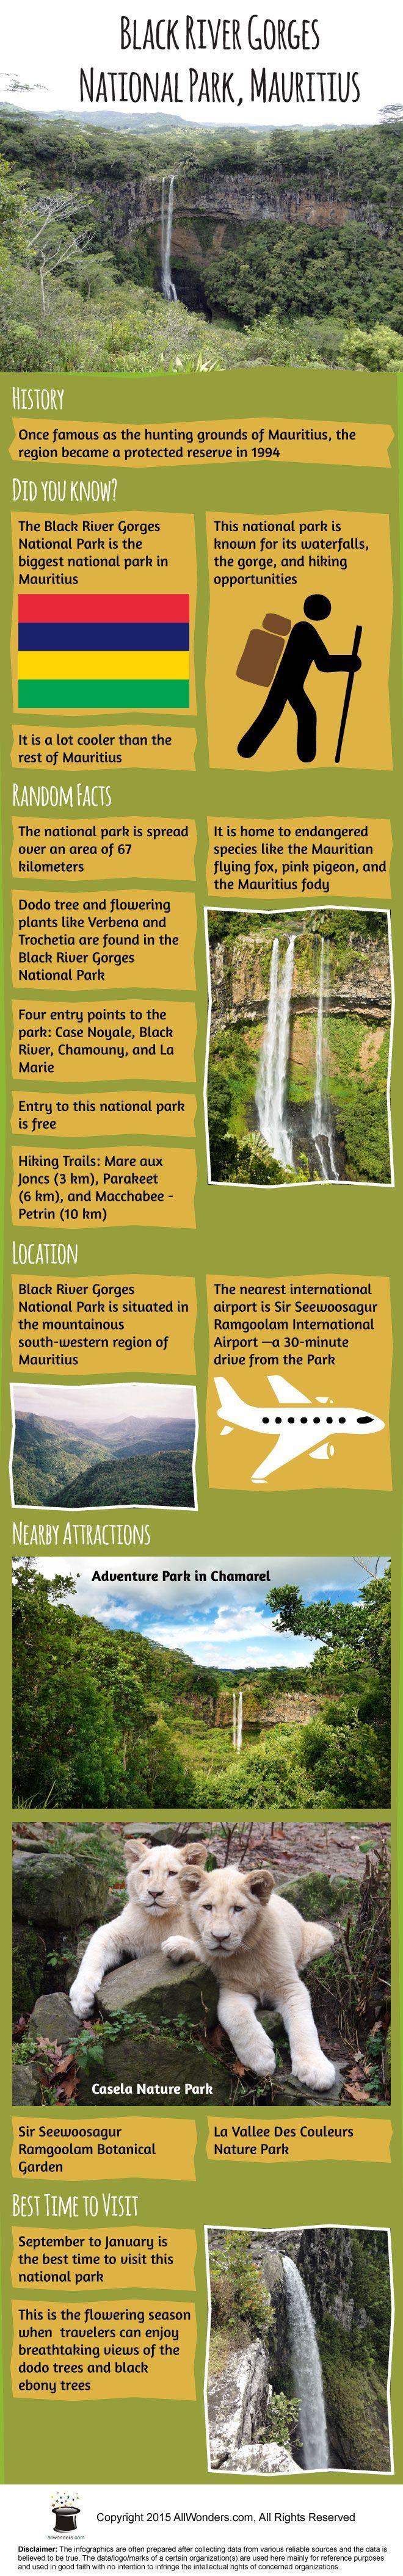 Black River Gorges National Park Infographic